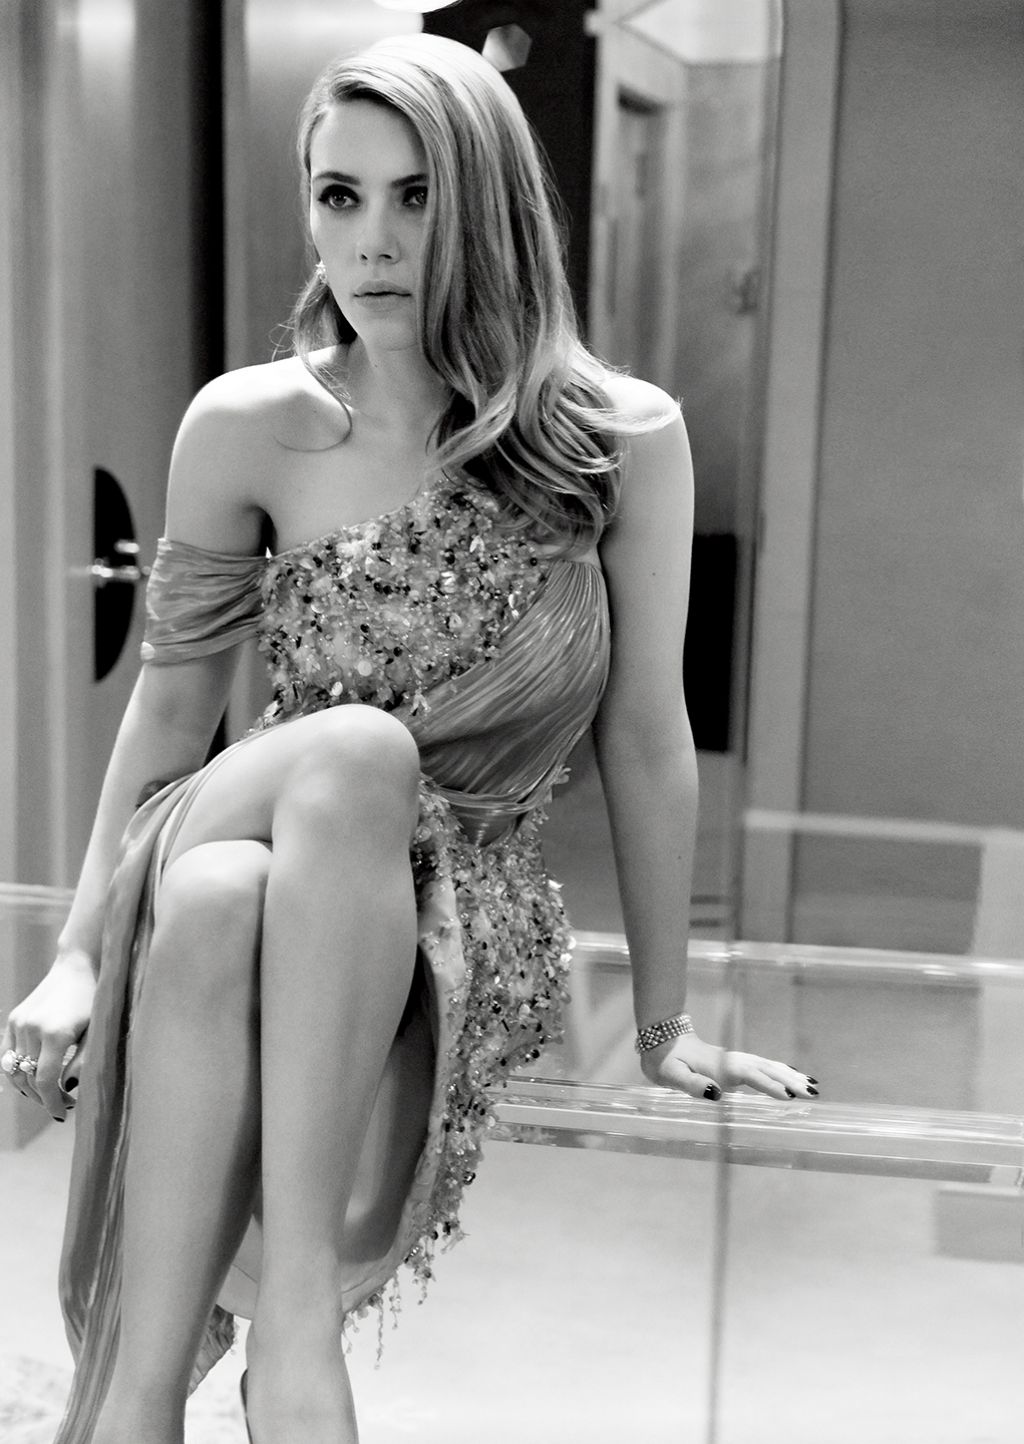 Scarlett Johansson Vanity Fair Magazine May 2014 Issue Hq